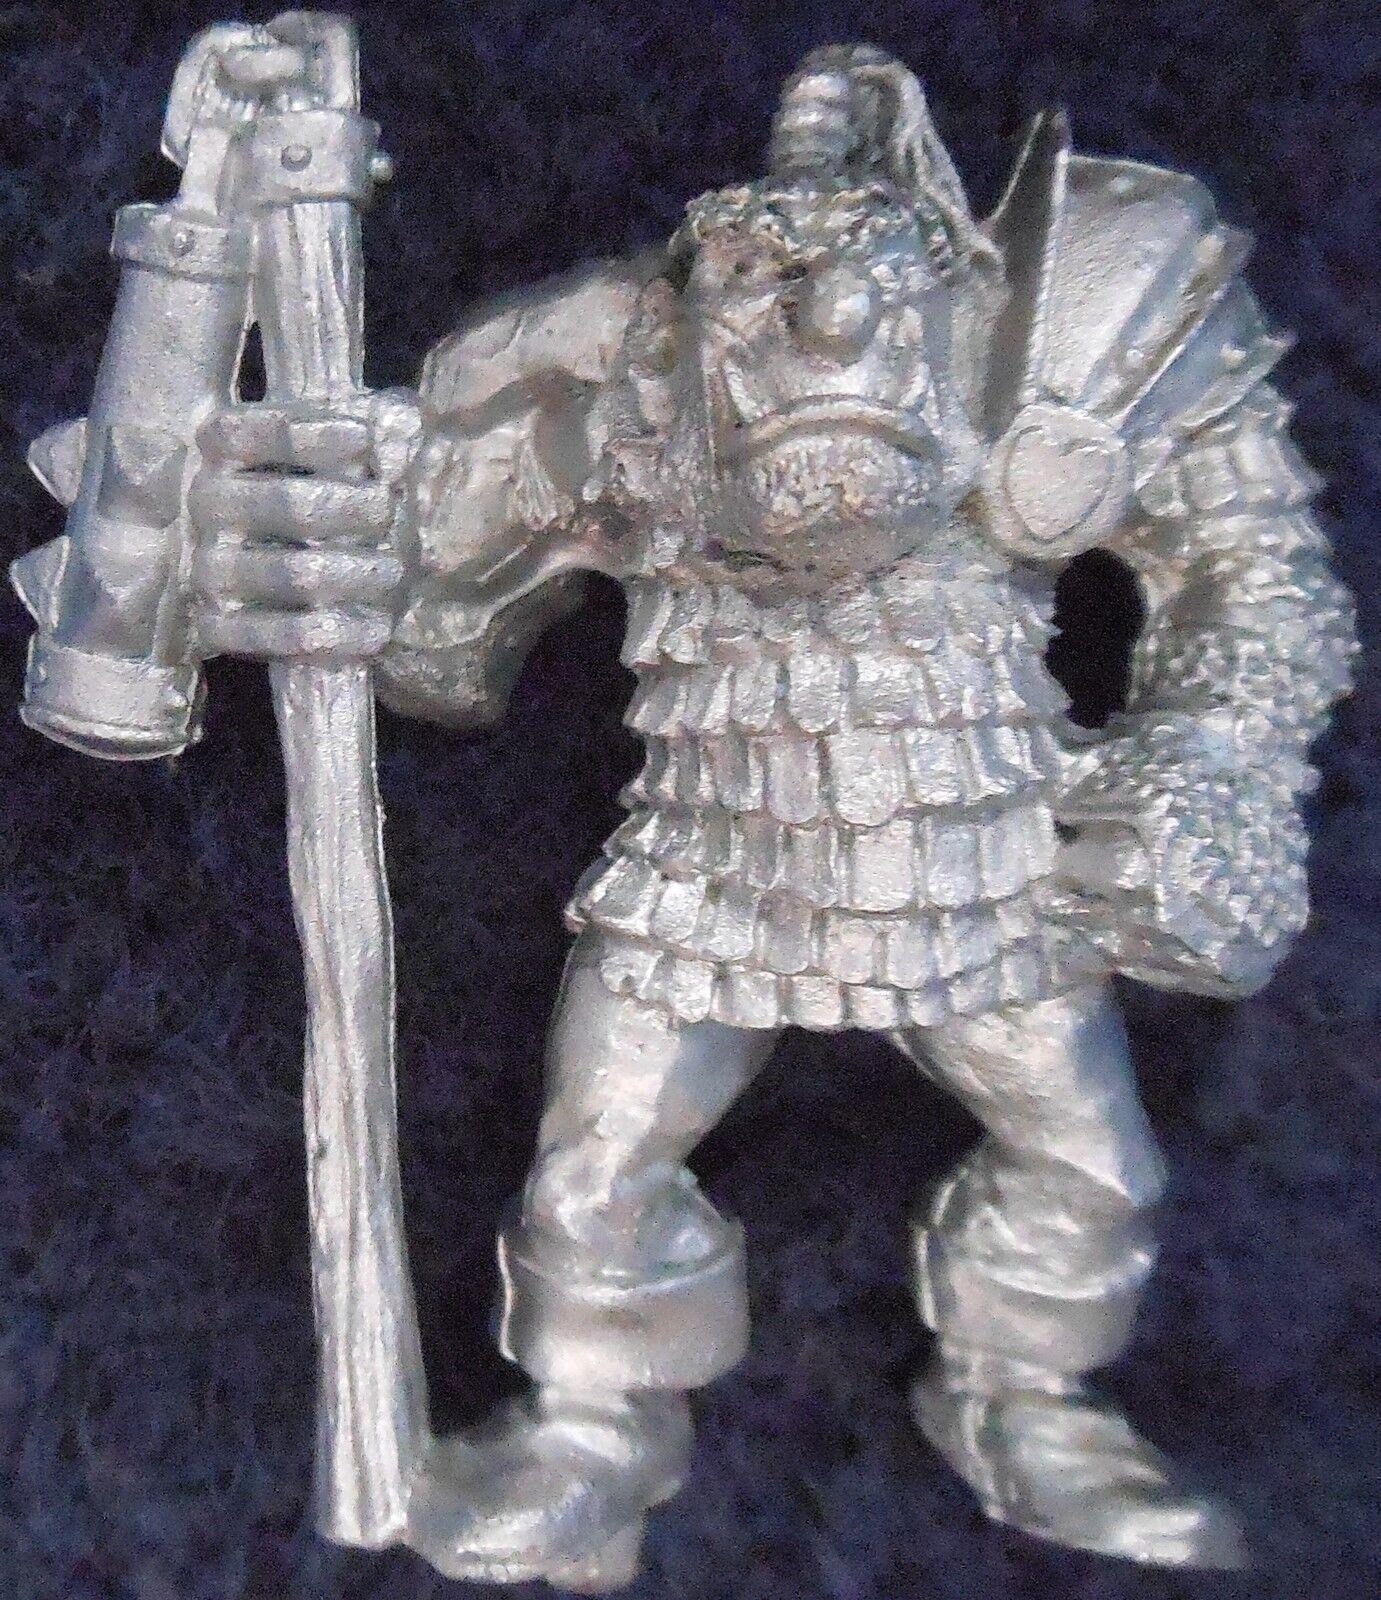 1989 Maraudeur OGRE mm42   3 B WARHAMMER Armée citadelle royaumes mercenaire taureaux ogor